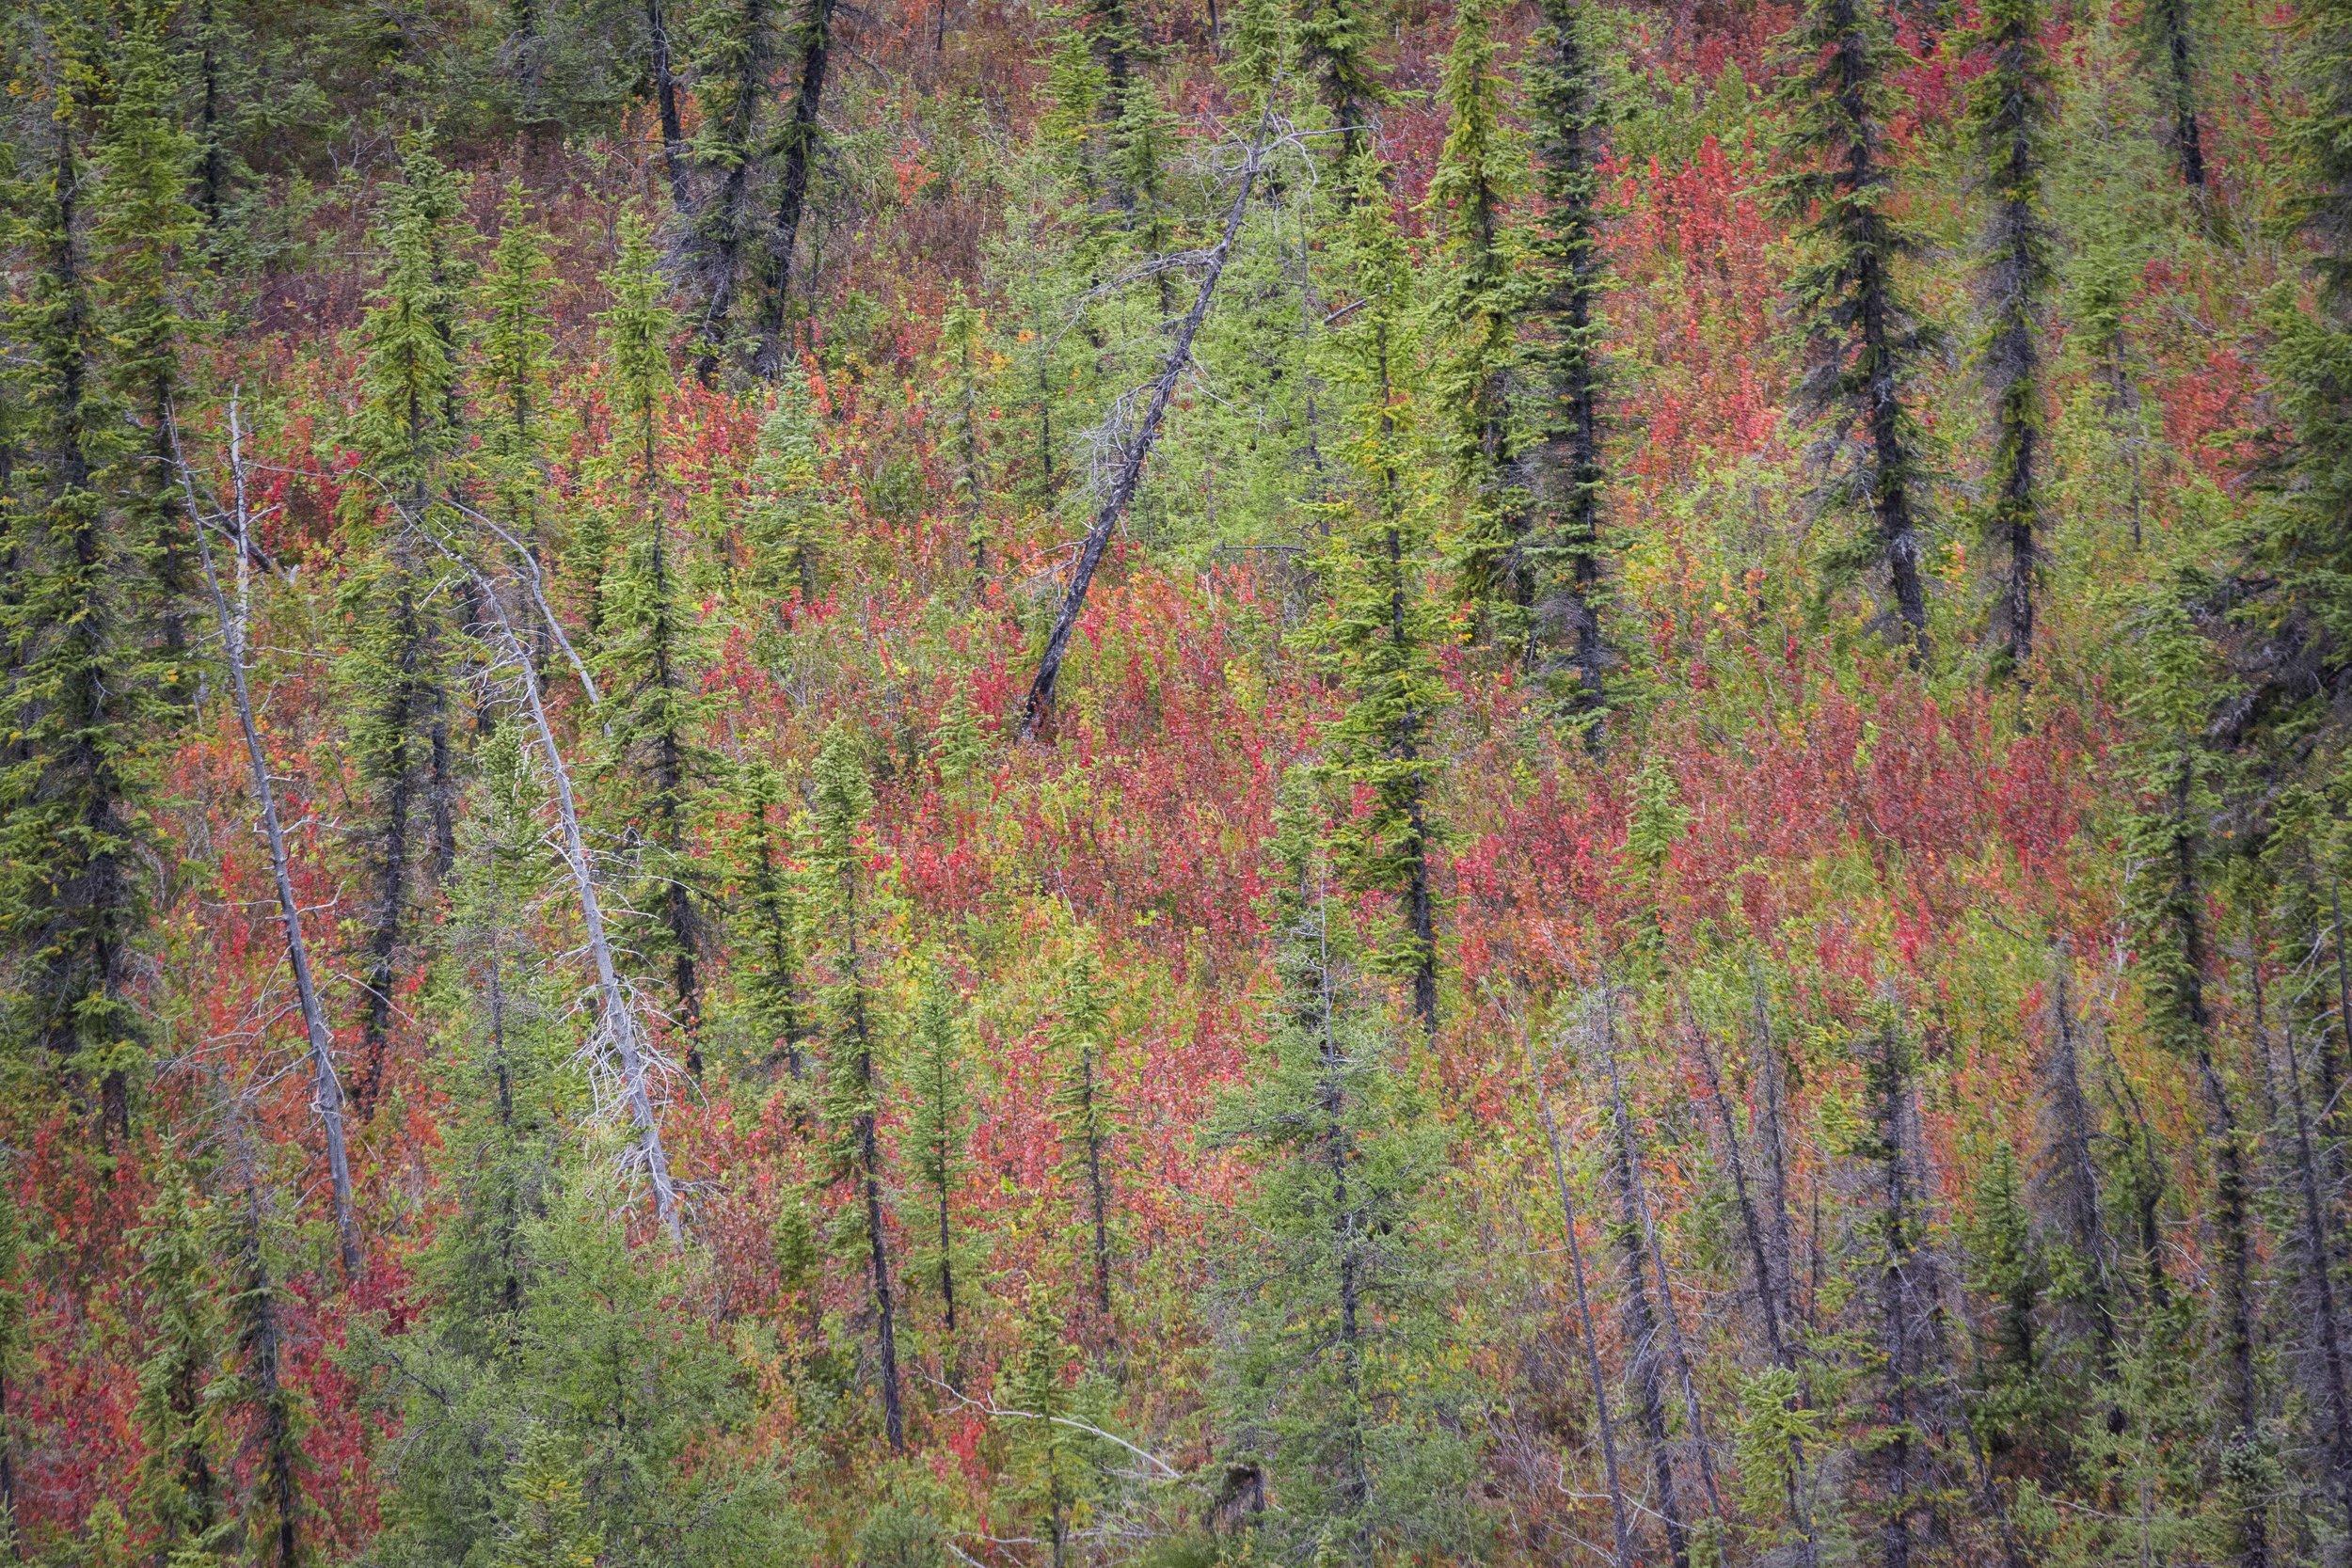 Dempster Highway, Roadtrip, Landscape, Arctic, rob gubiani, Tundra, Tombstone, Tuktoyuktuk, Inuvik, Dempster, Yukon, travel, wanderlust, boreal, forest, boreal forest, autumn, fall,